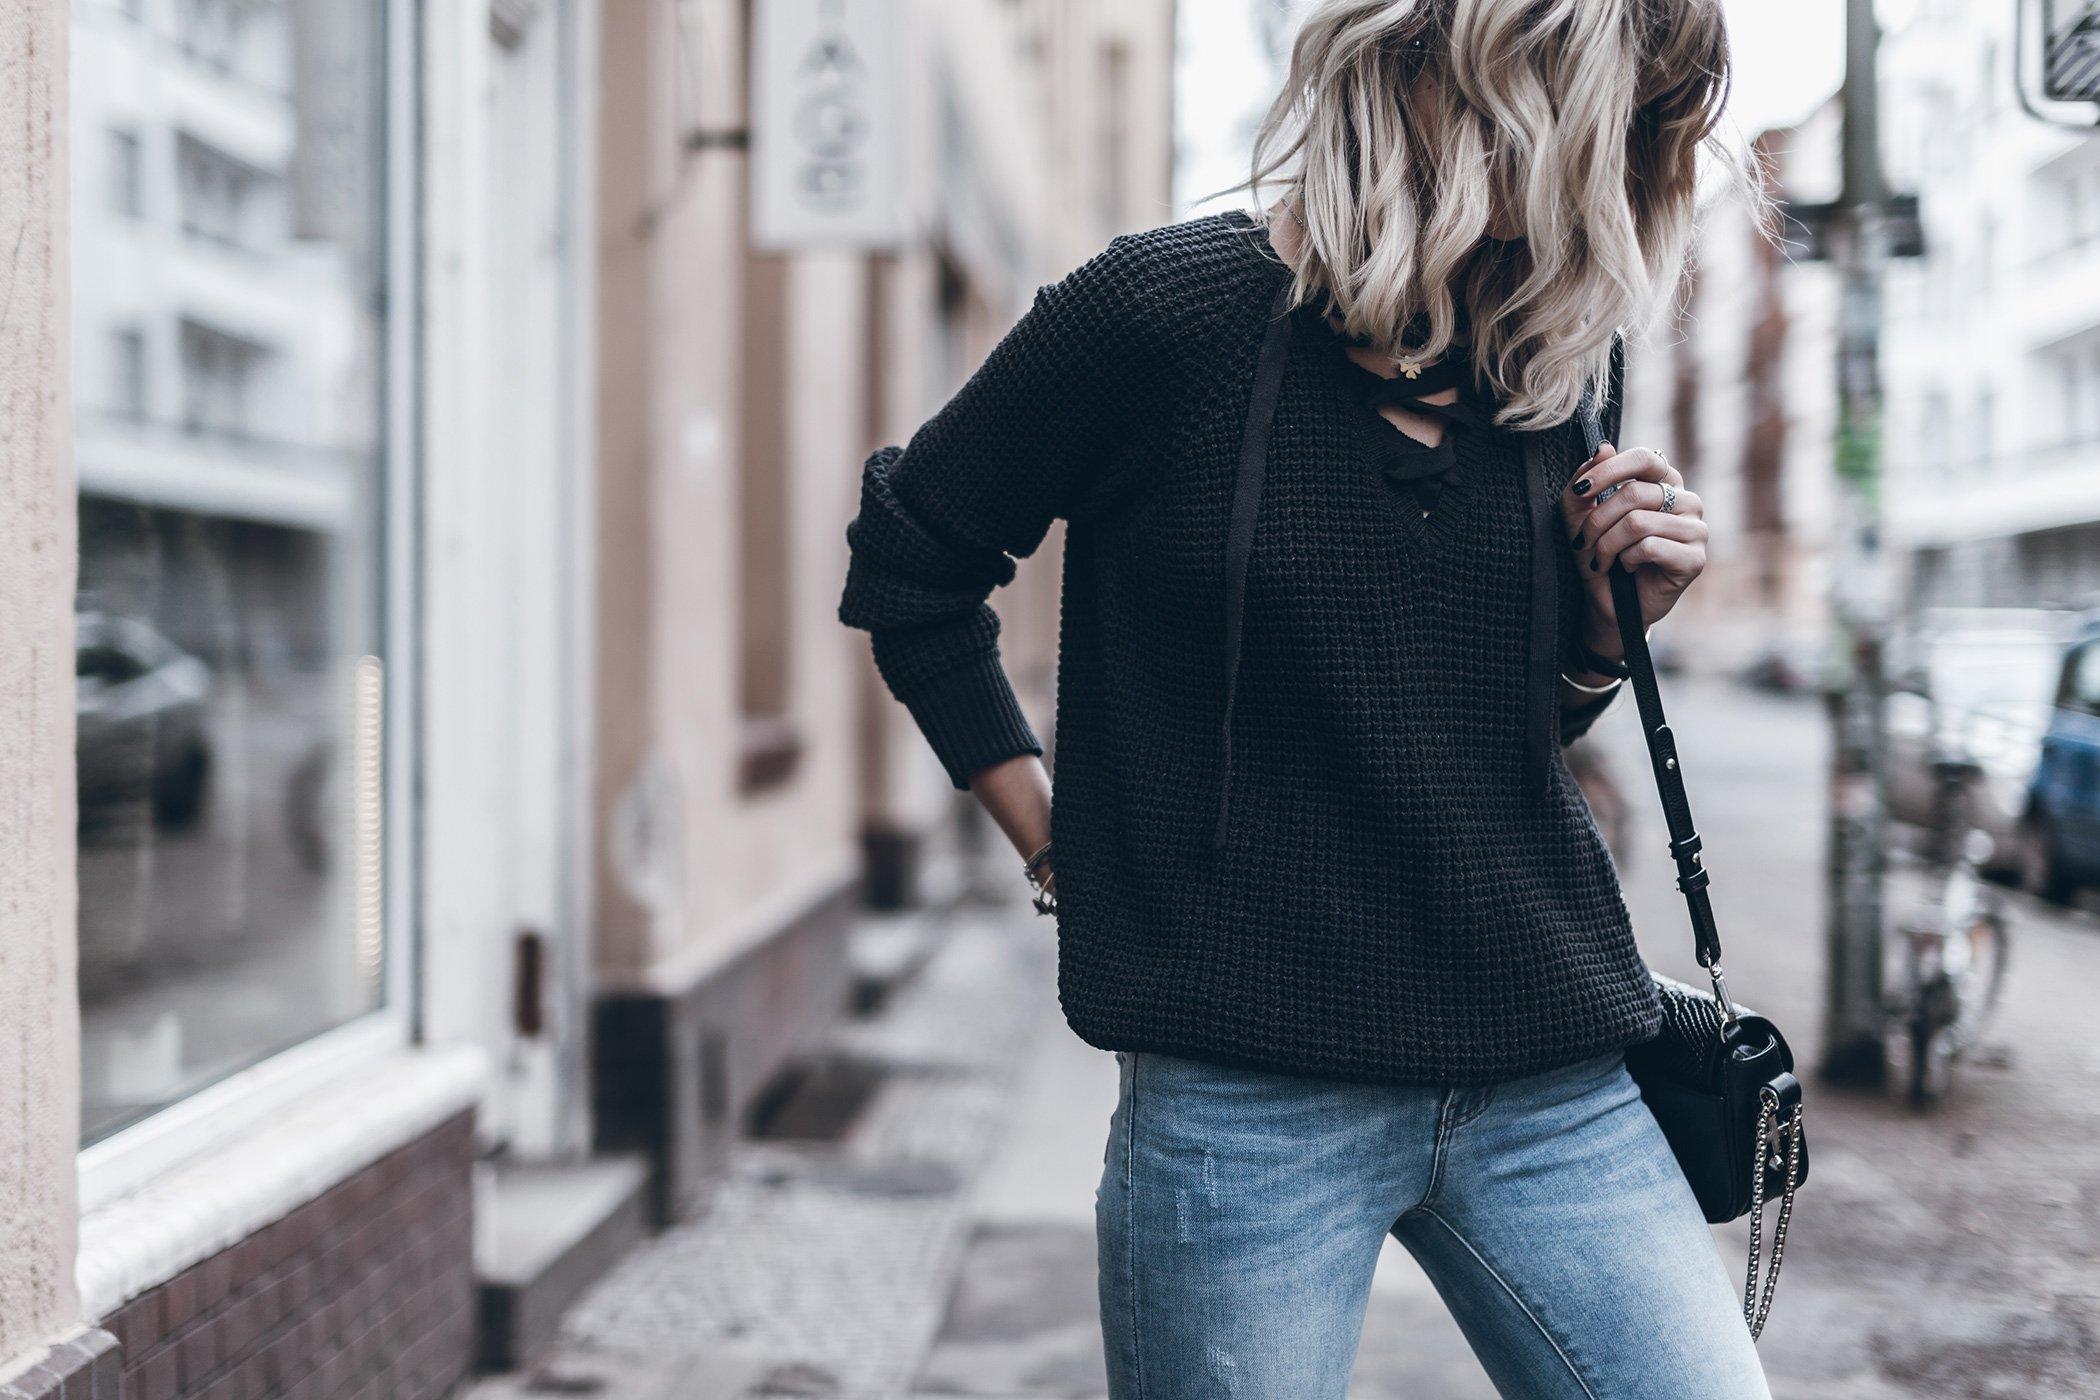 mikuta-vila-jeans-and-sweater-6